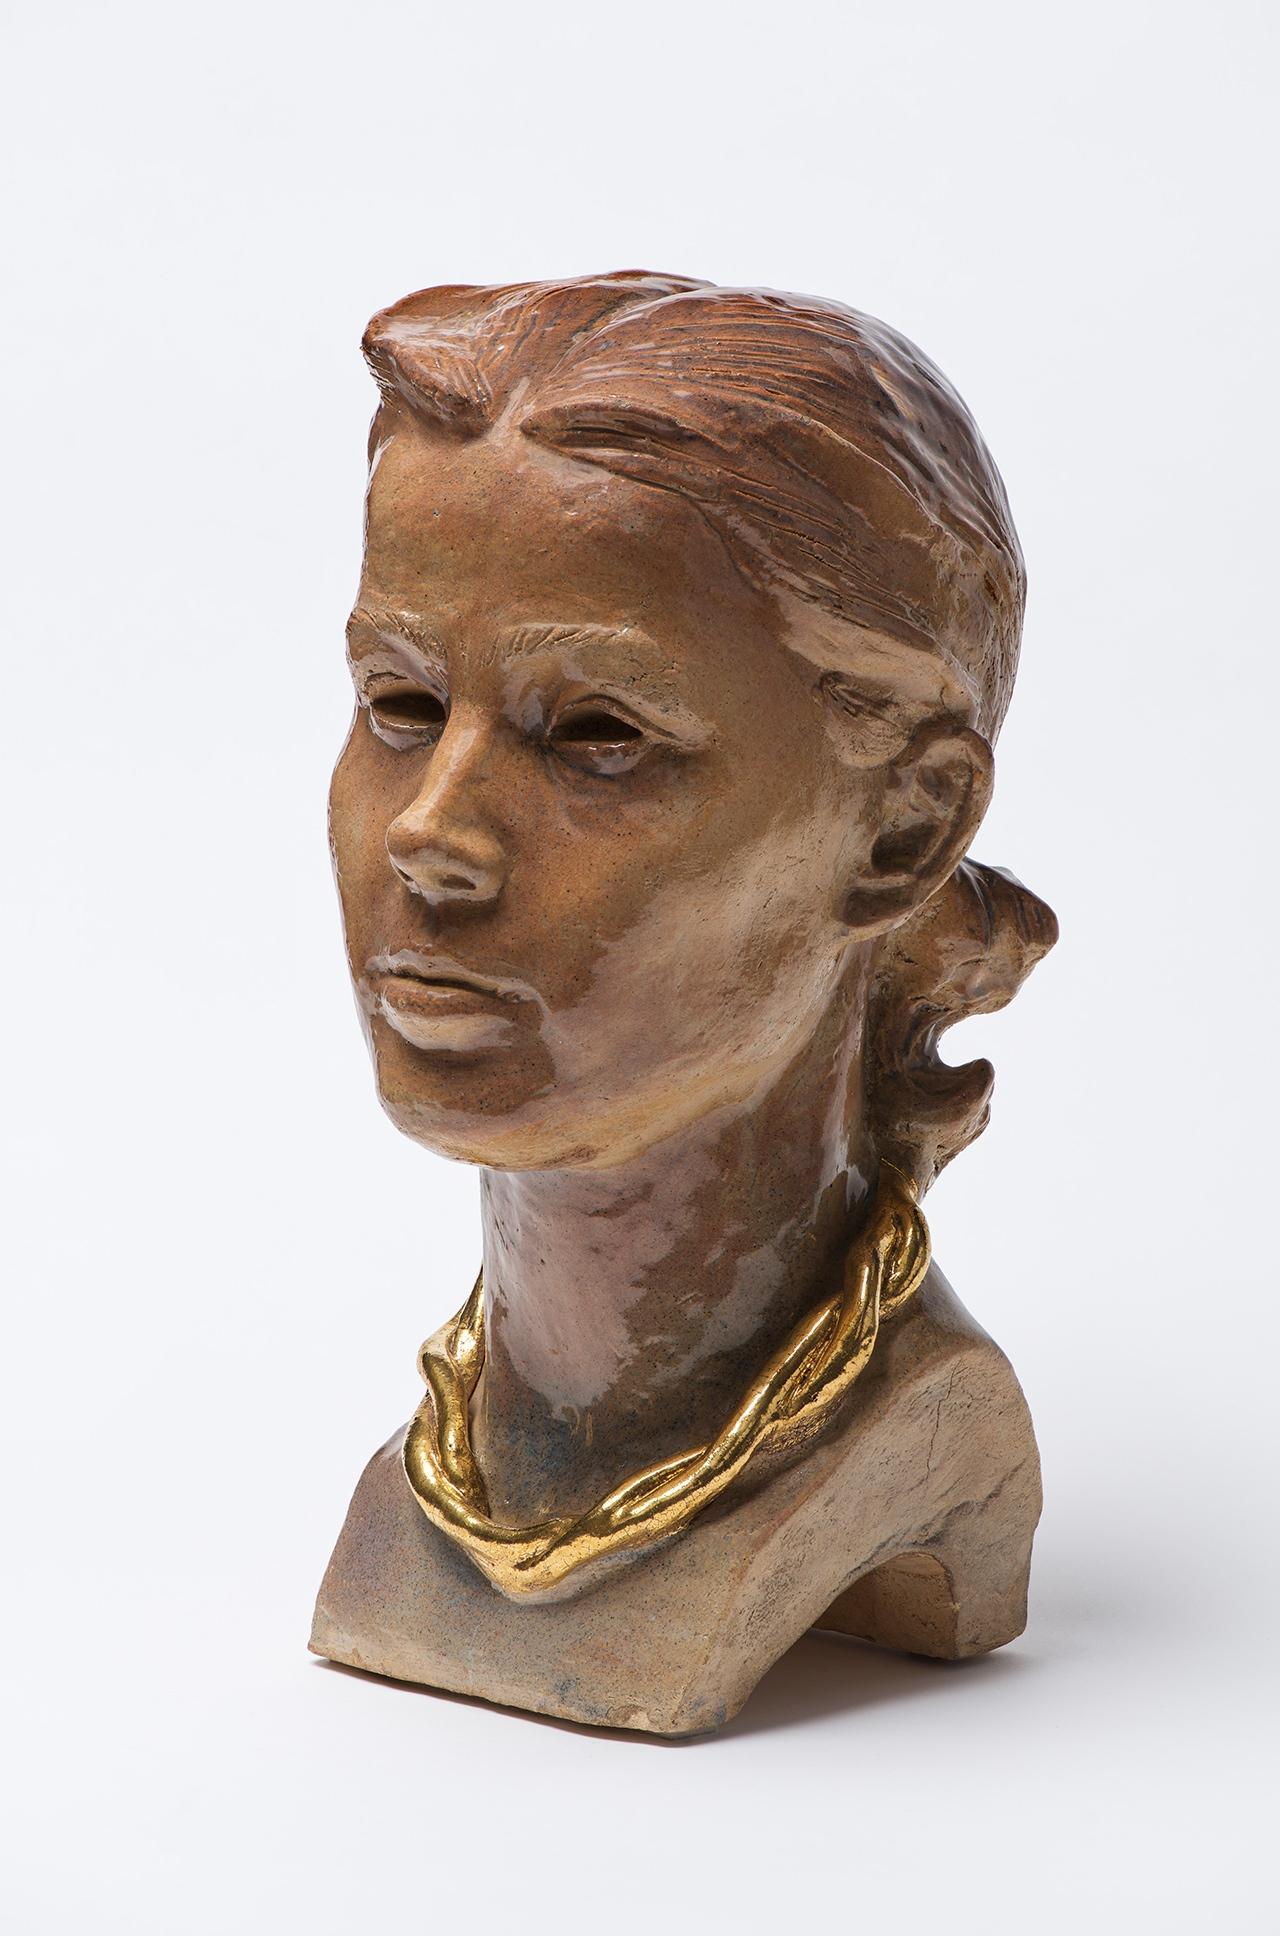 Александр Дейнека. Голова девушки. 1930-е. Керамика. Частная коллекция.